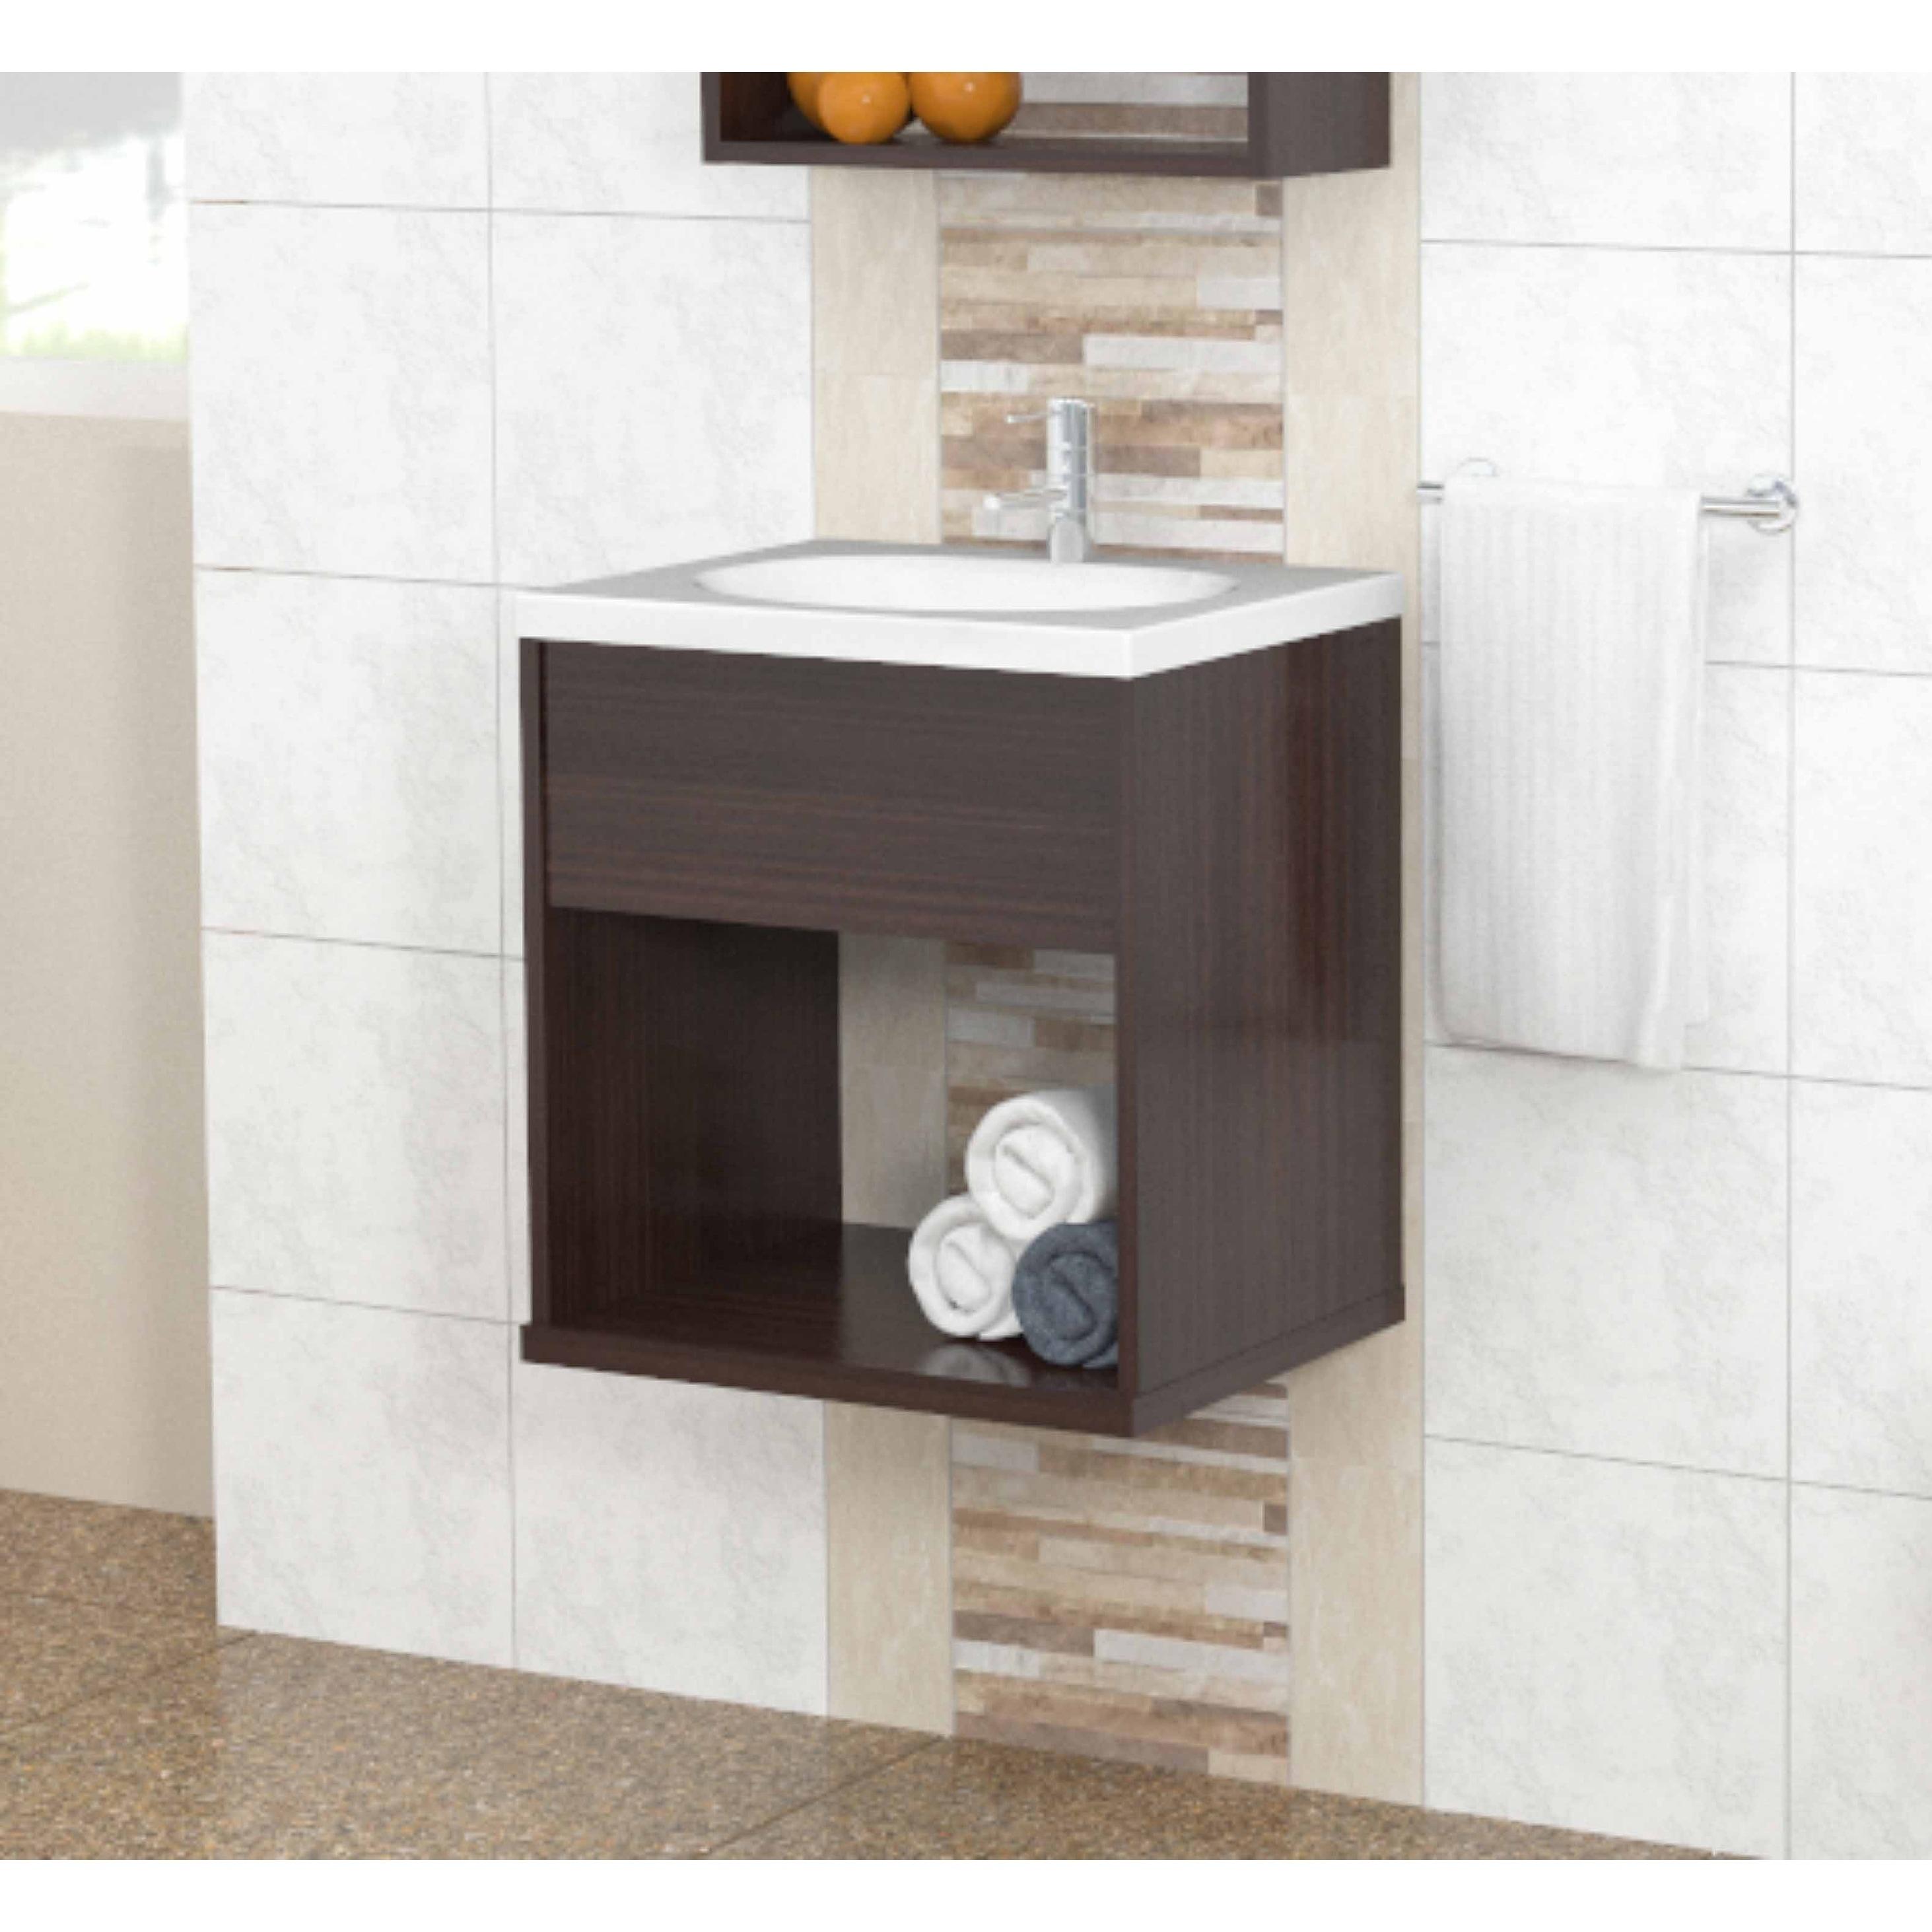 Inval Modern Espresso Bathroom Vanity Overstock 16901070